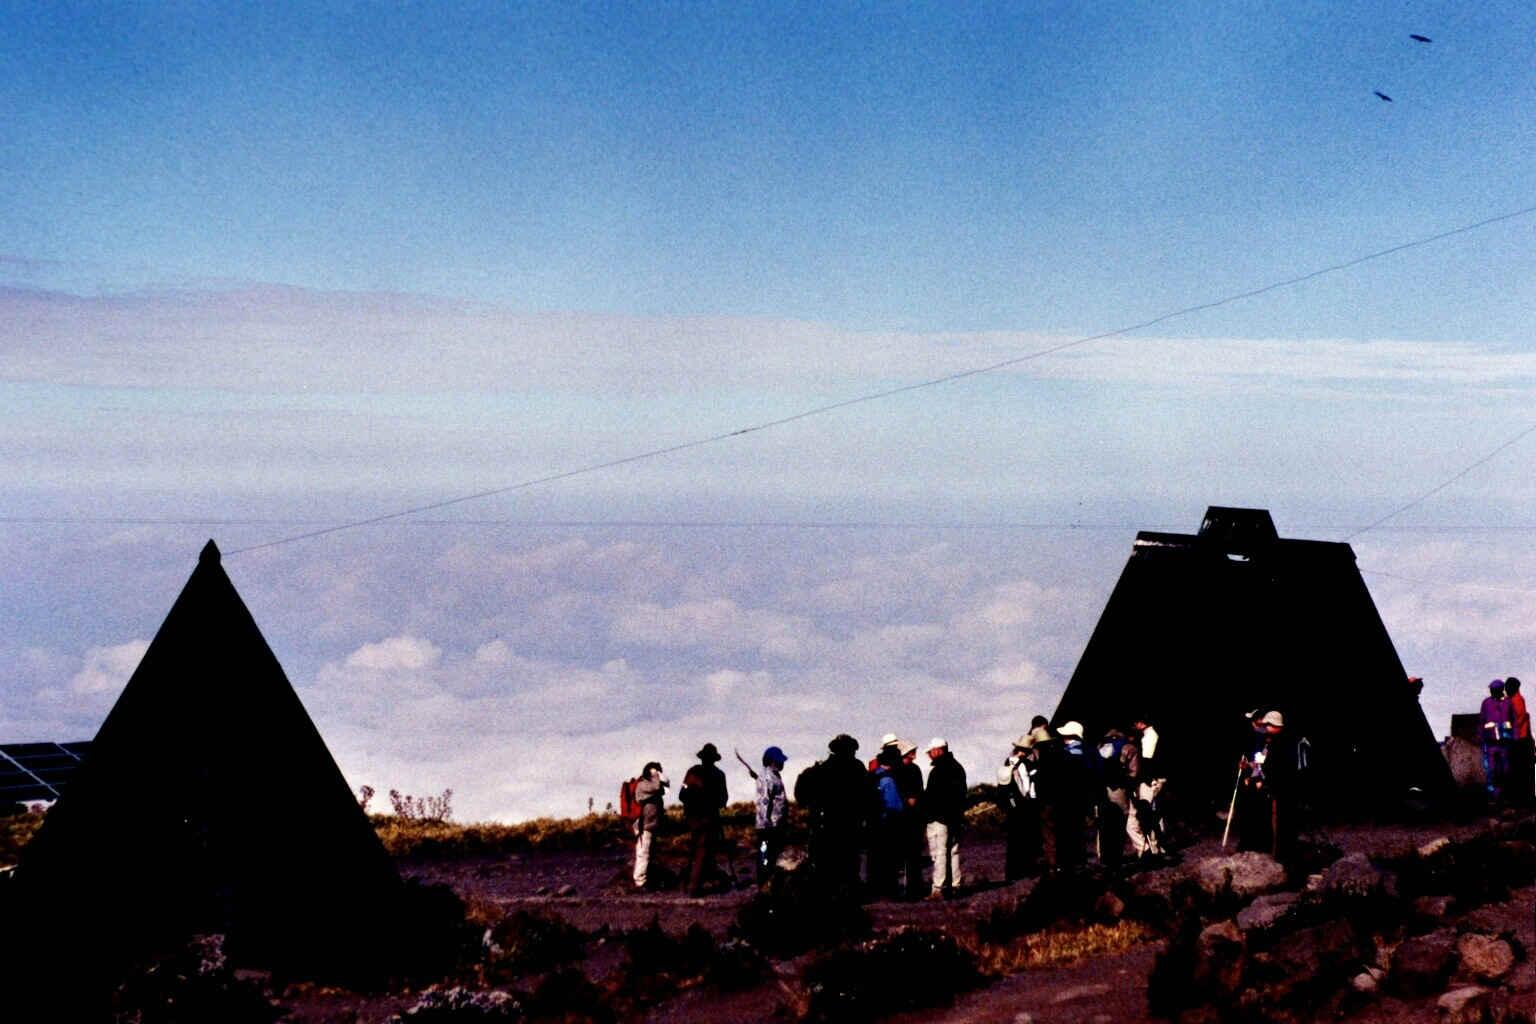 wp-content/uploads/itineraries/Kilimanjaro/kili-rongai-horombo-hut.jpg